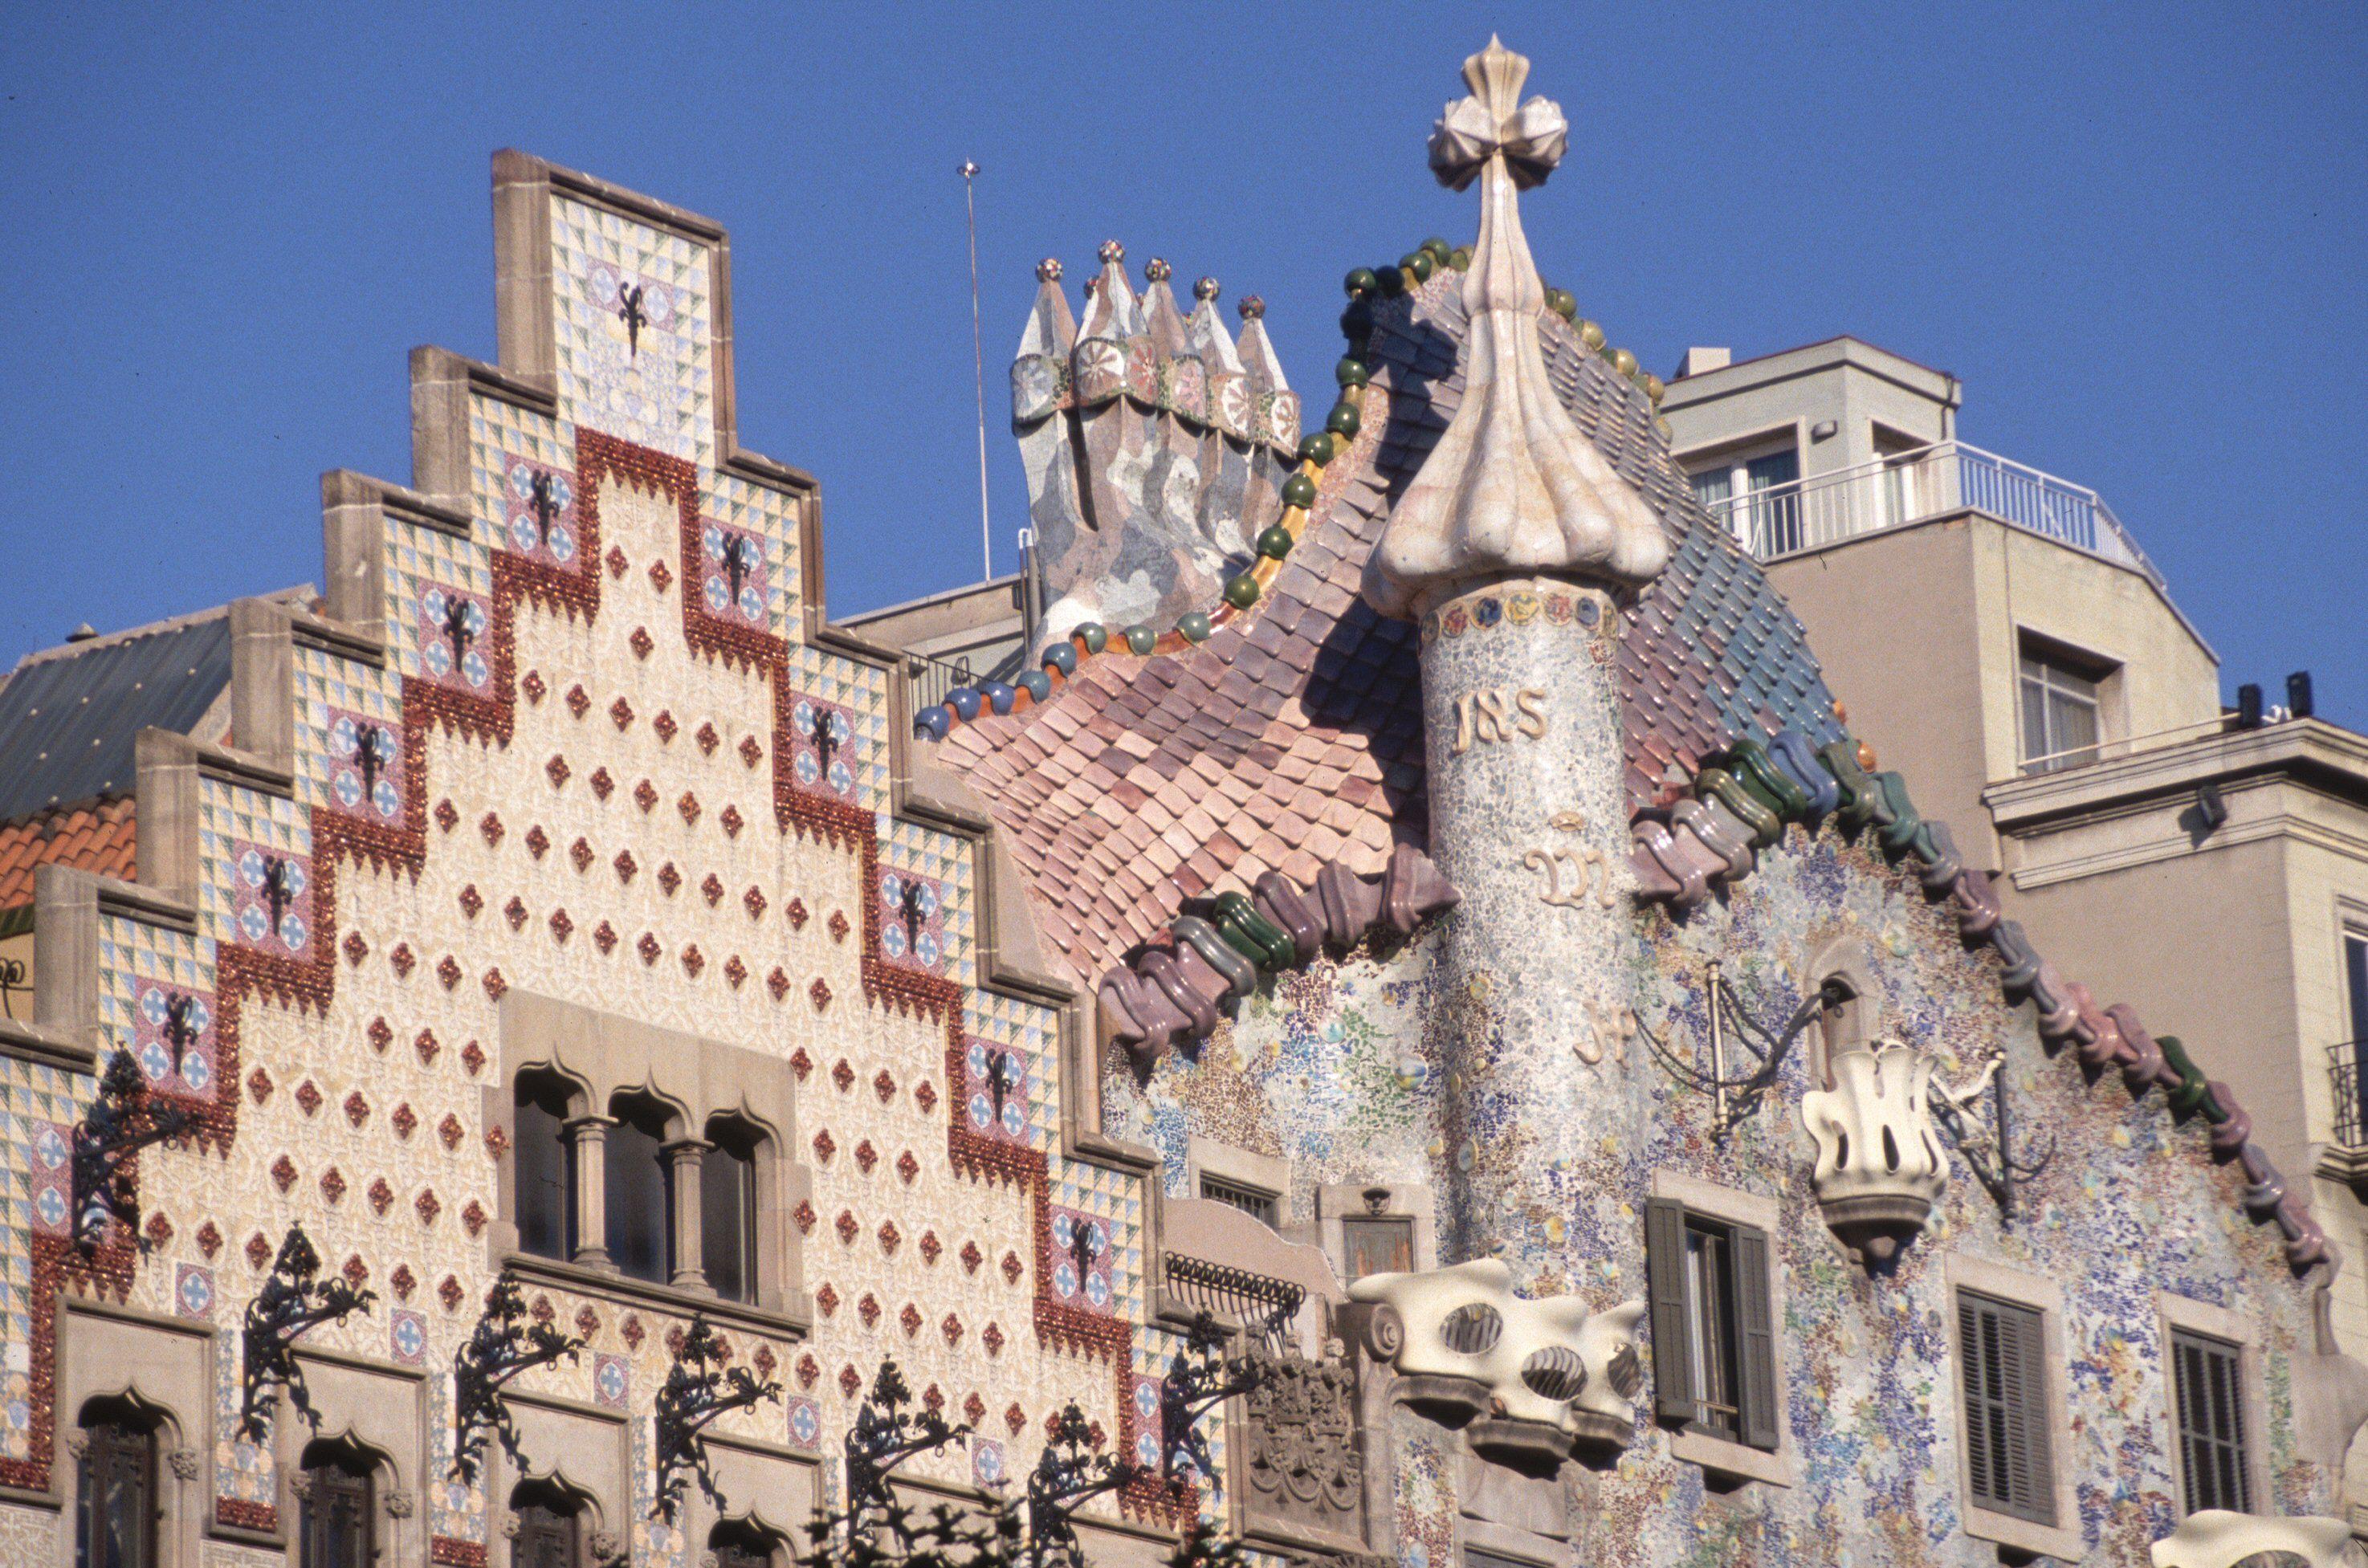 Gables Designed by Antonio Gaudi for Casa Amatller and the Casa Batllo, Barcelona, Spain c. 1905